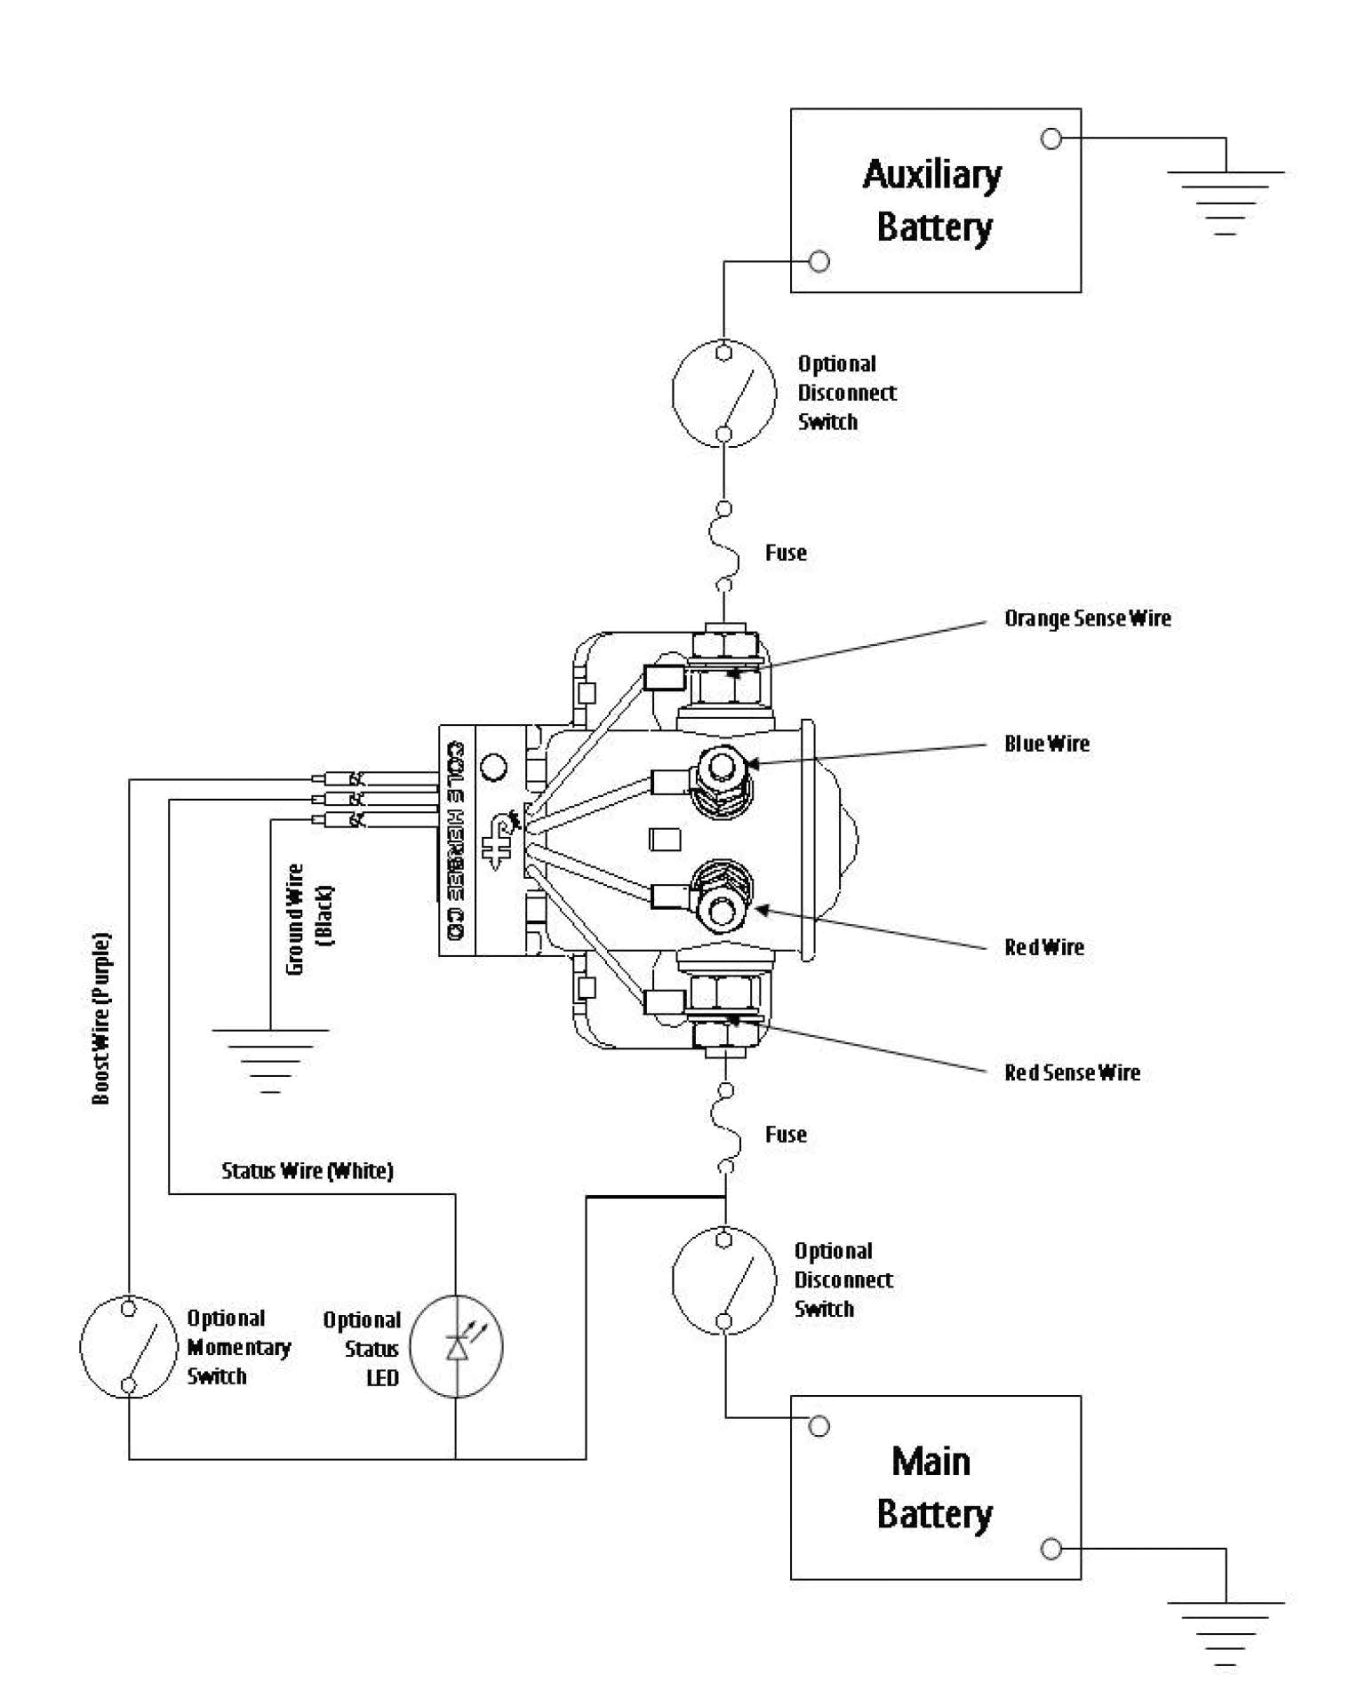 warn winch m15000 wiring diagram new wiring diagram for winch solenoid amp warn atv winch solenoid wiring jpg